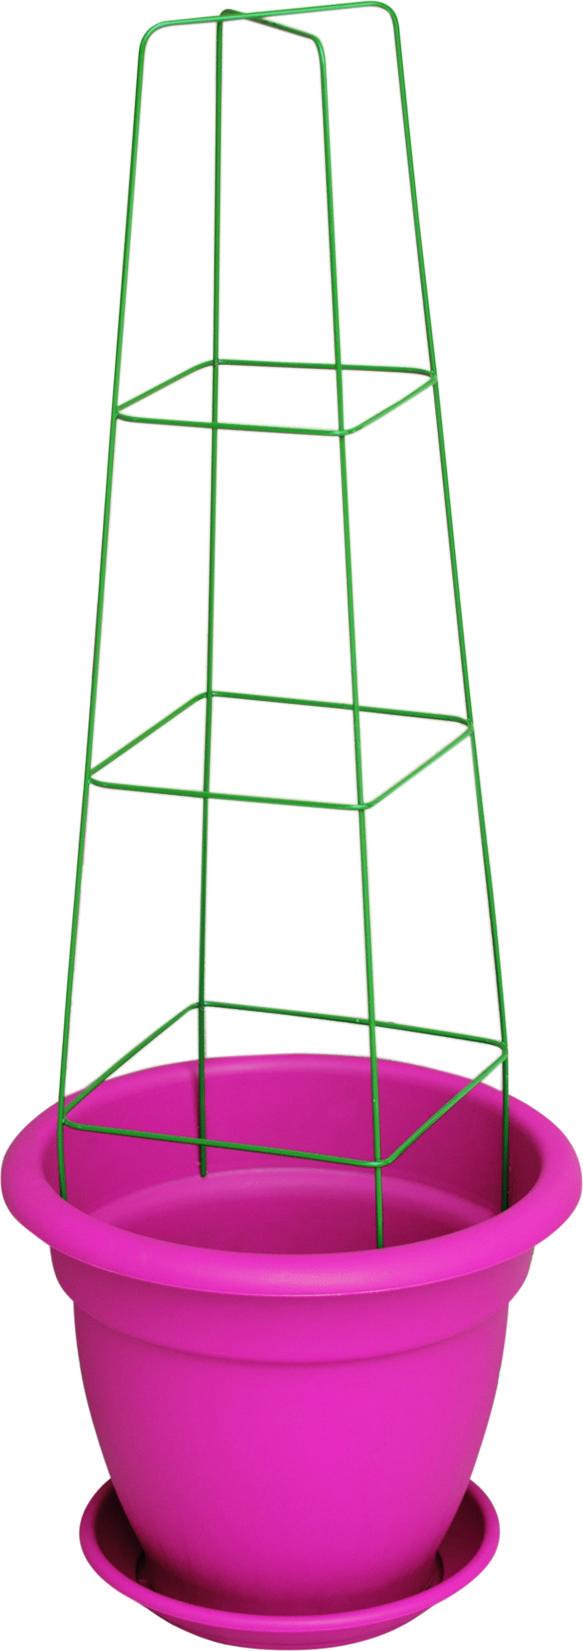 BABEL 35.2 Color: 054